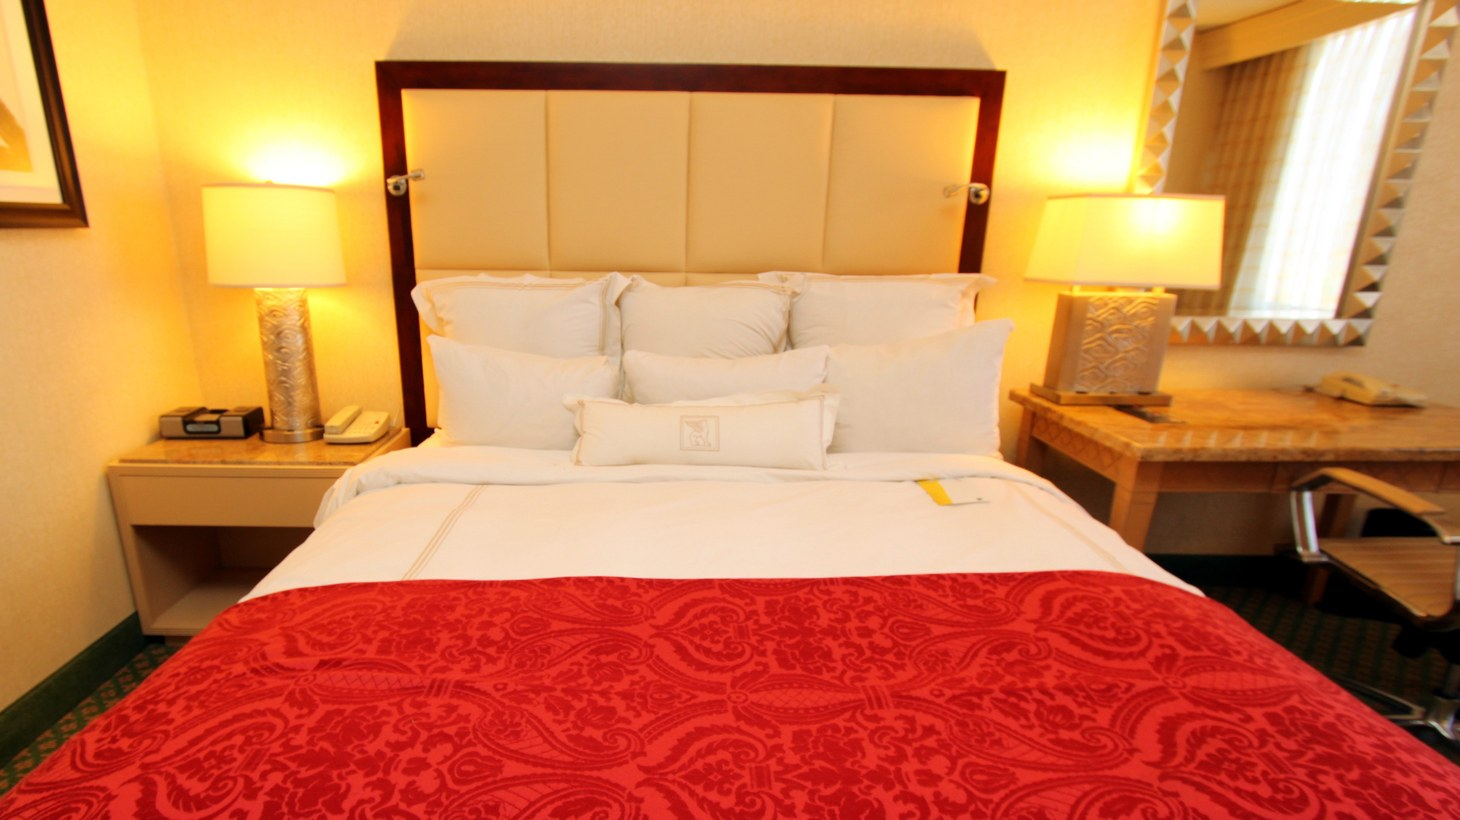 JW Marriott Hotel king bed.